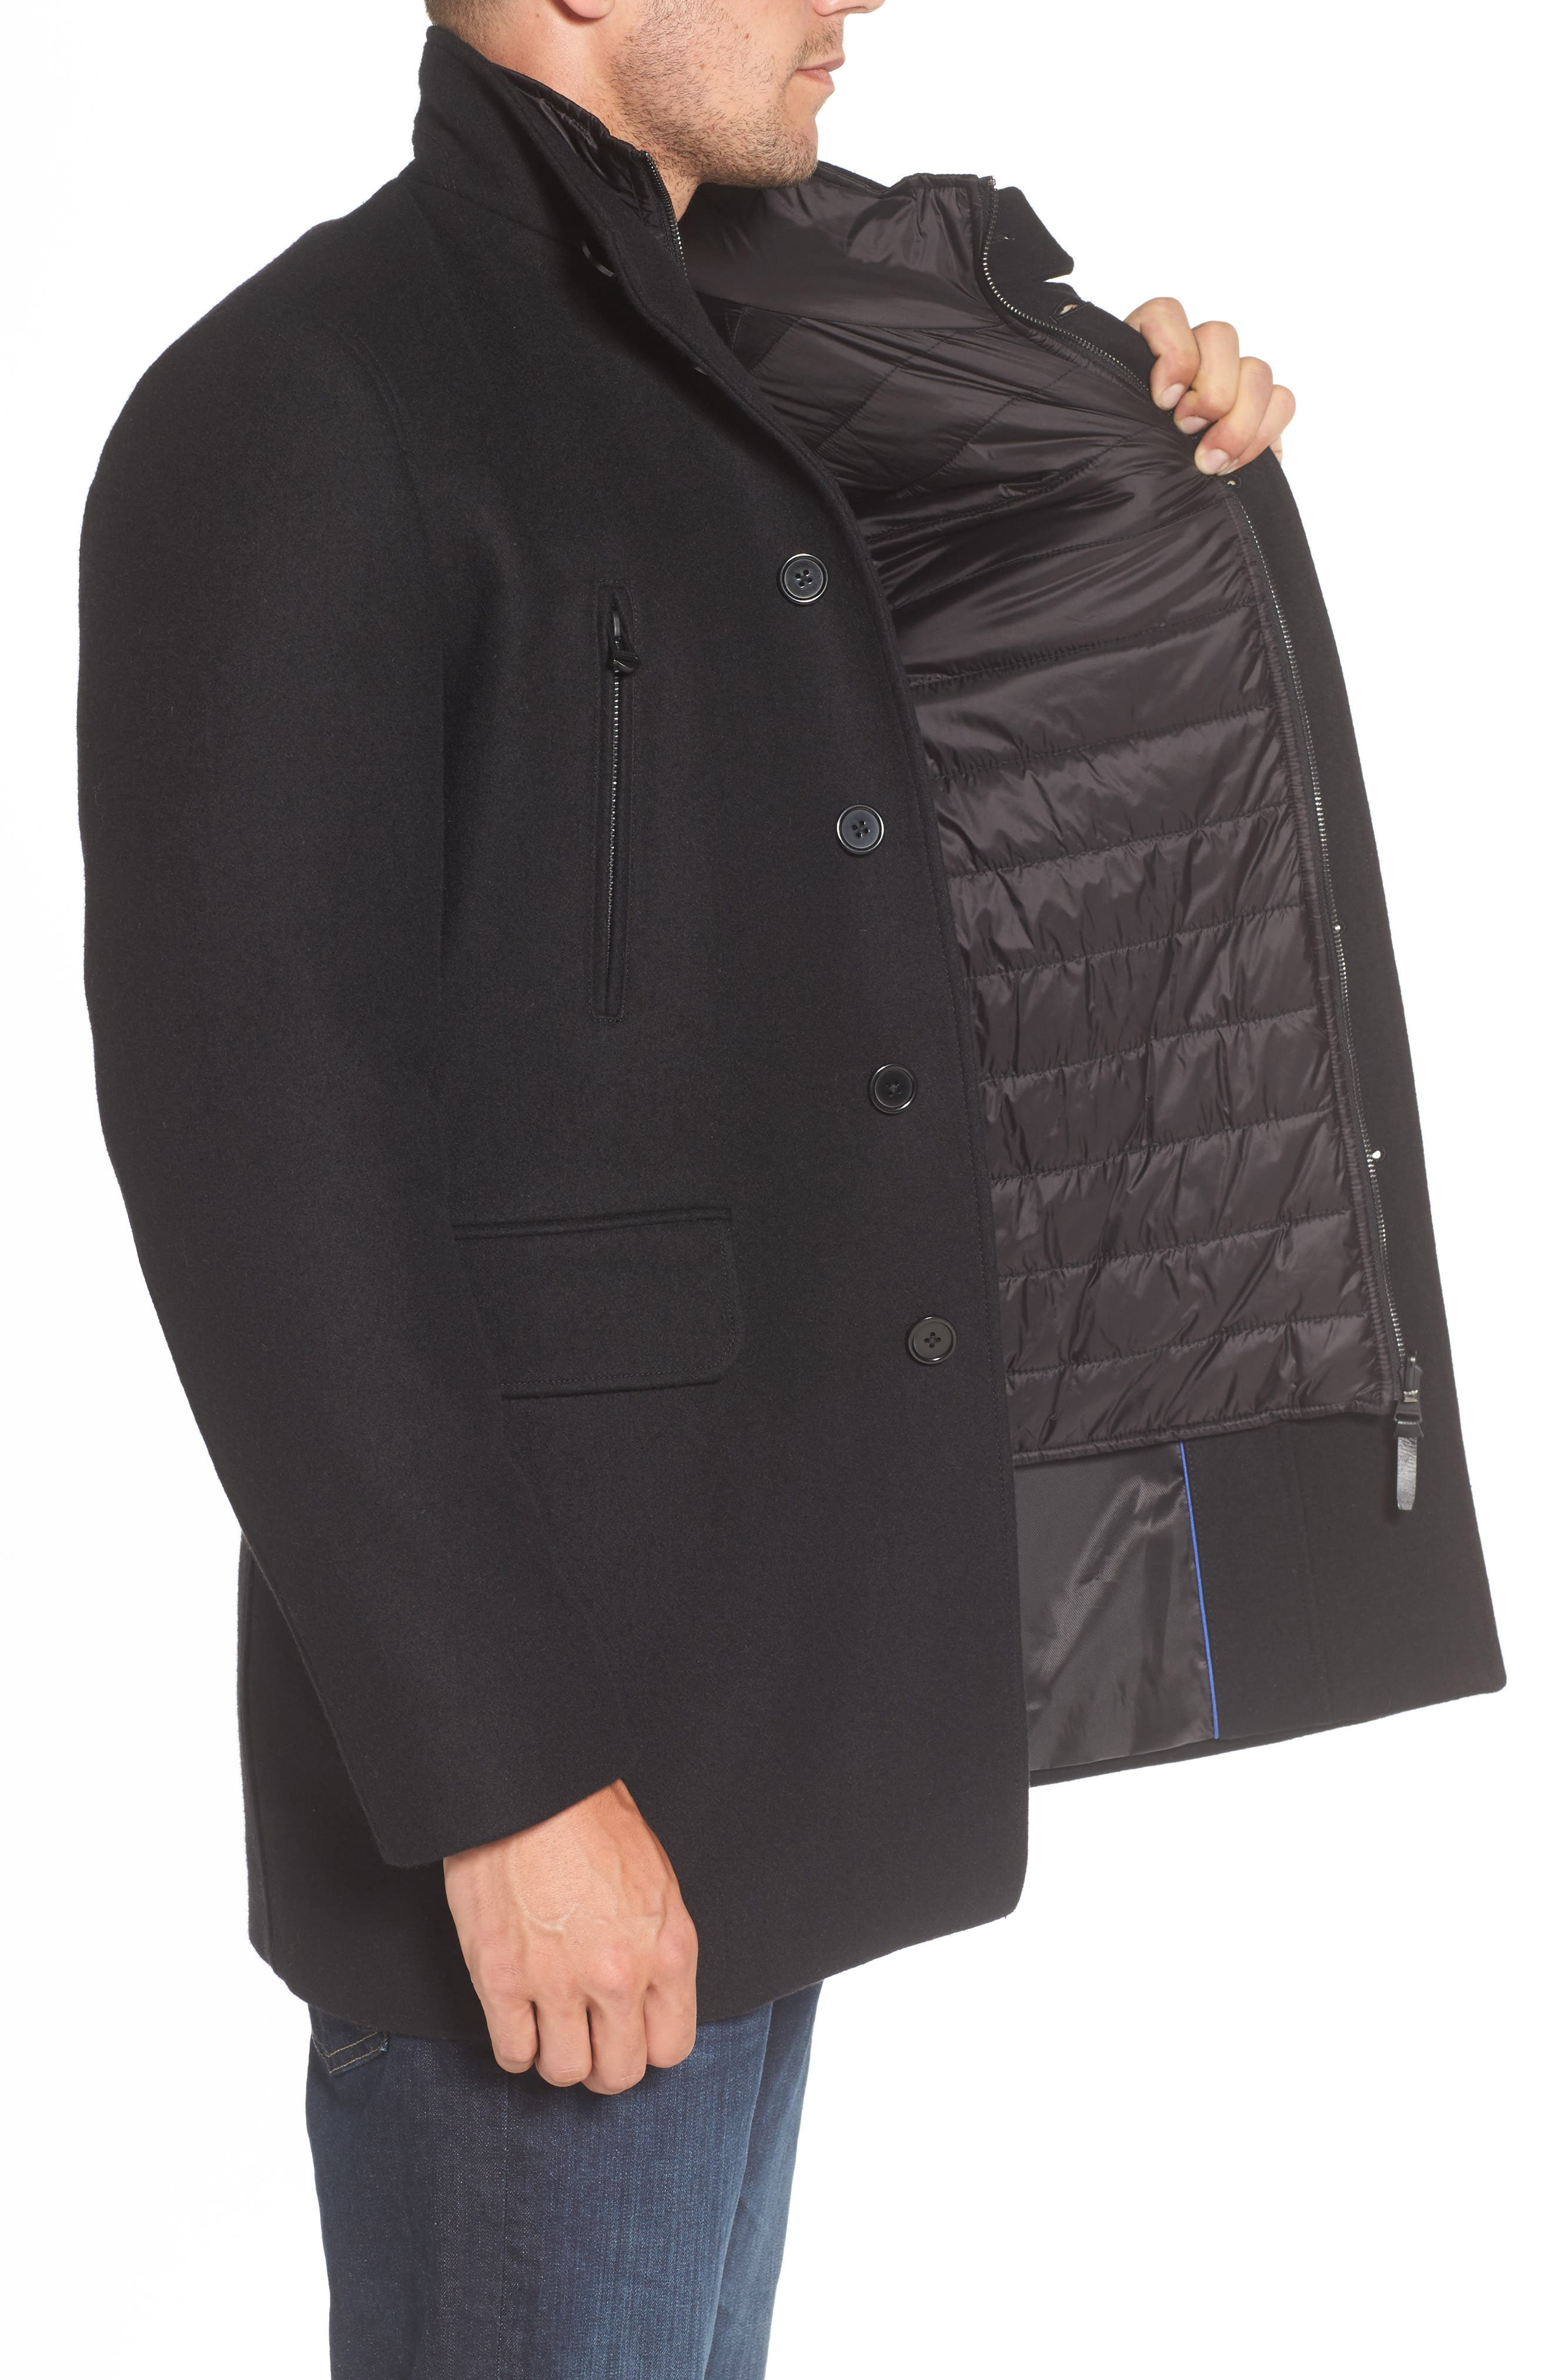 Wool Blend 3-in-1 Topcoat,                             Alternate thumbnail 3, color,                             001